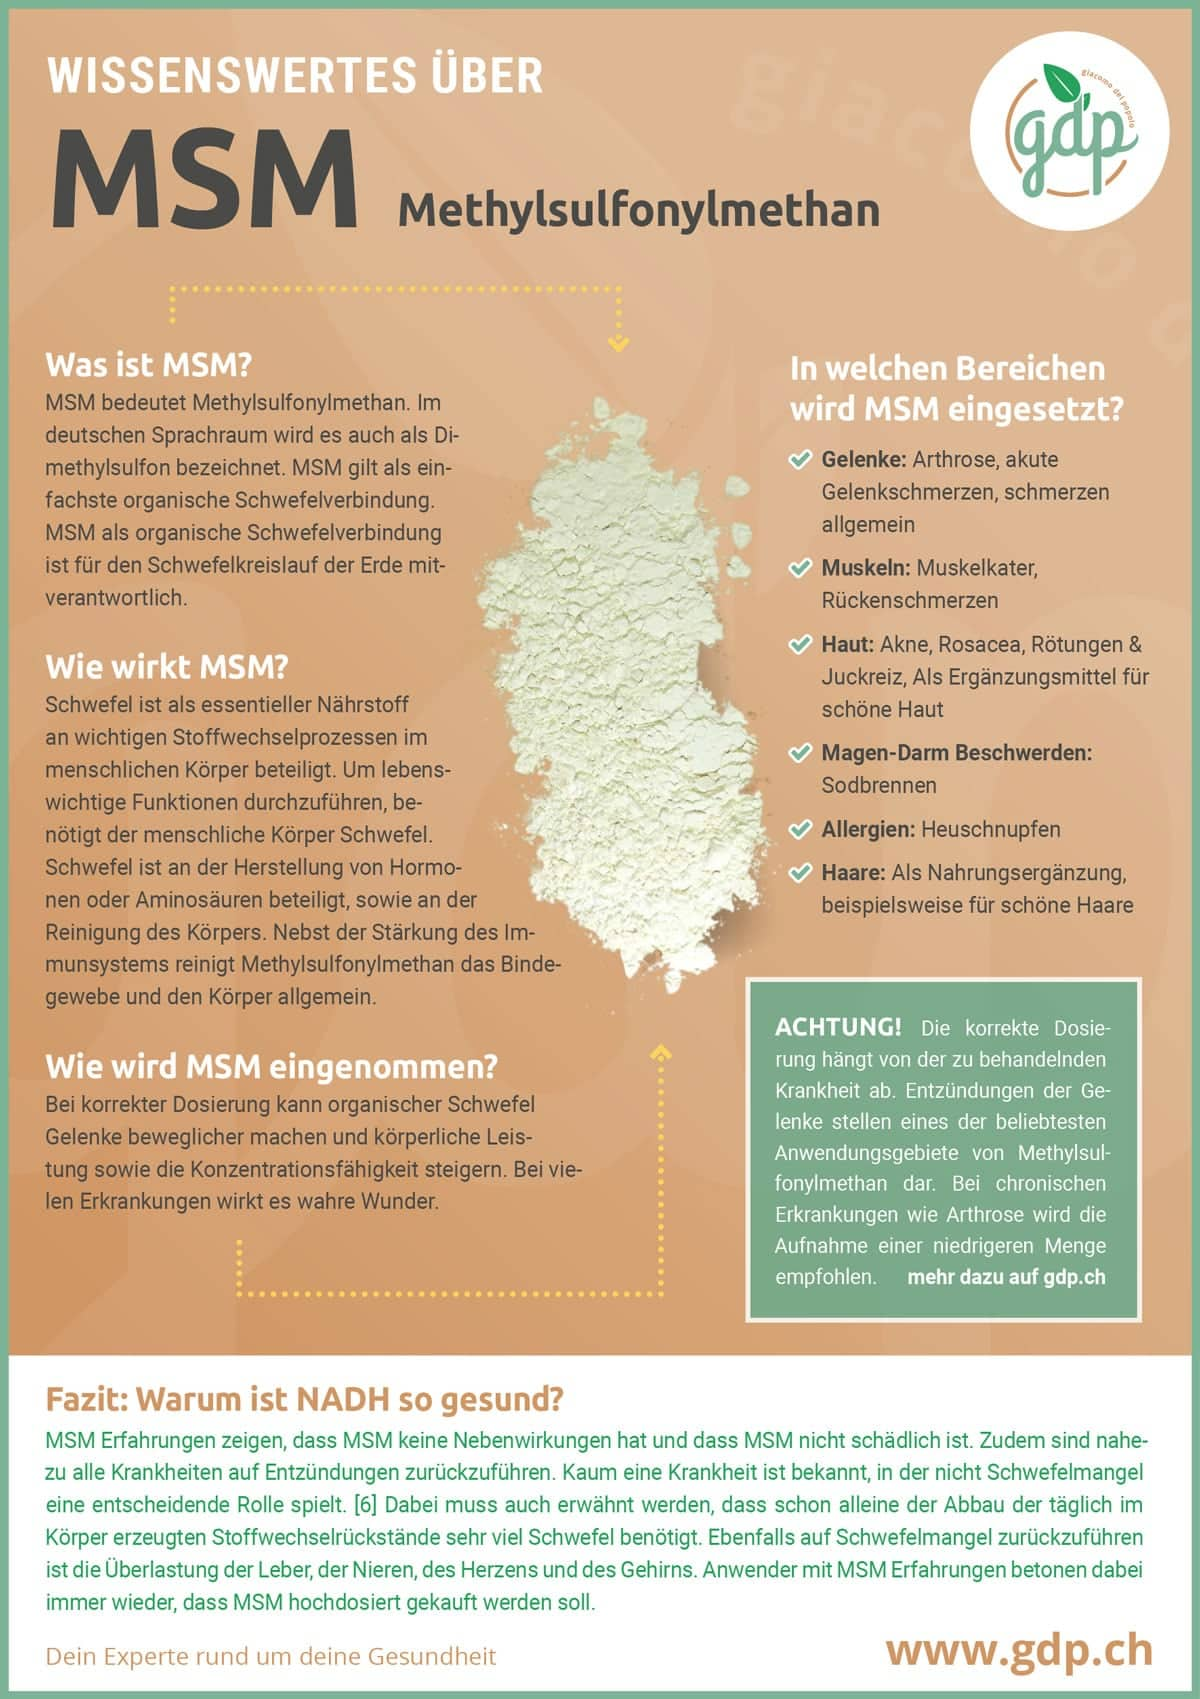 MSM Infografik